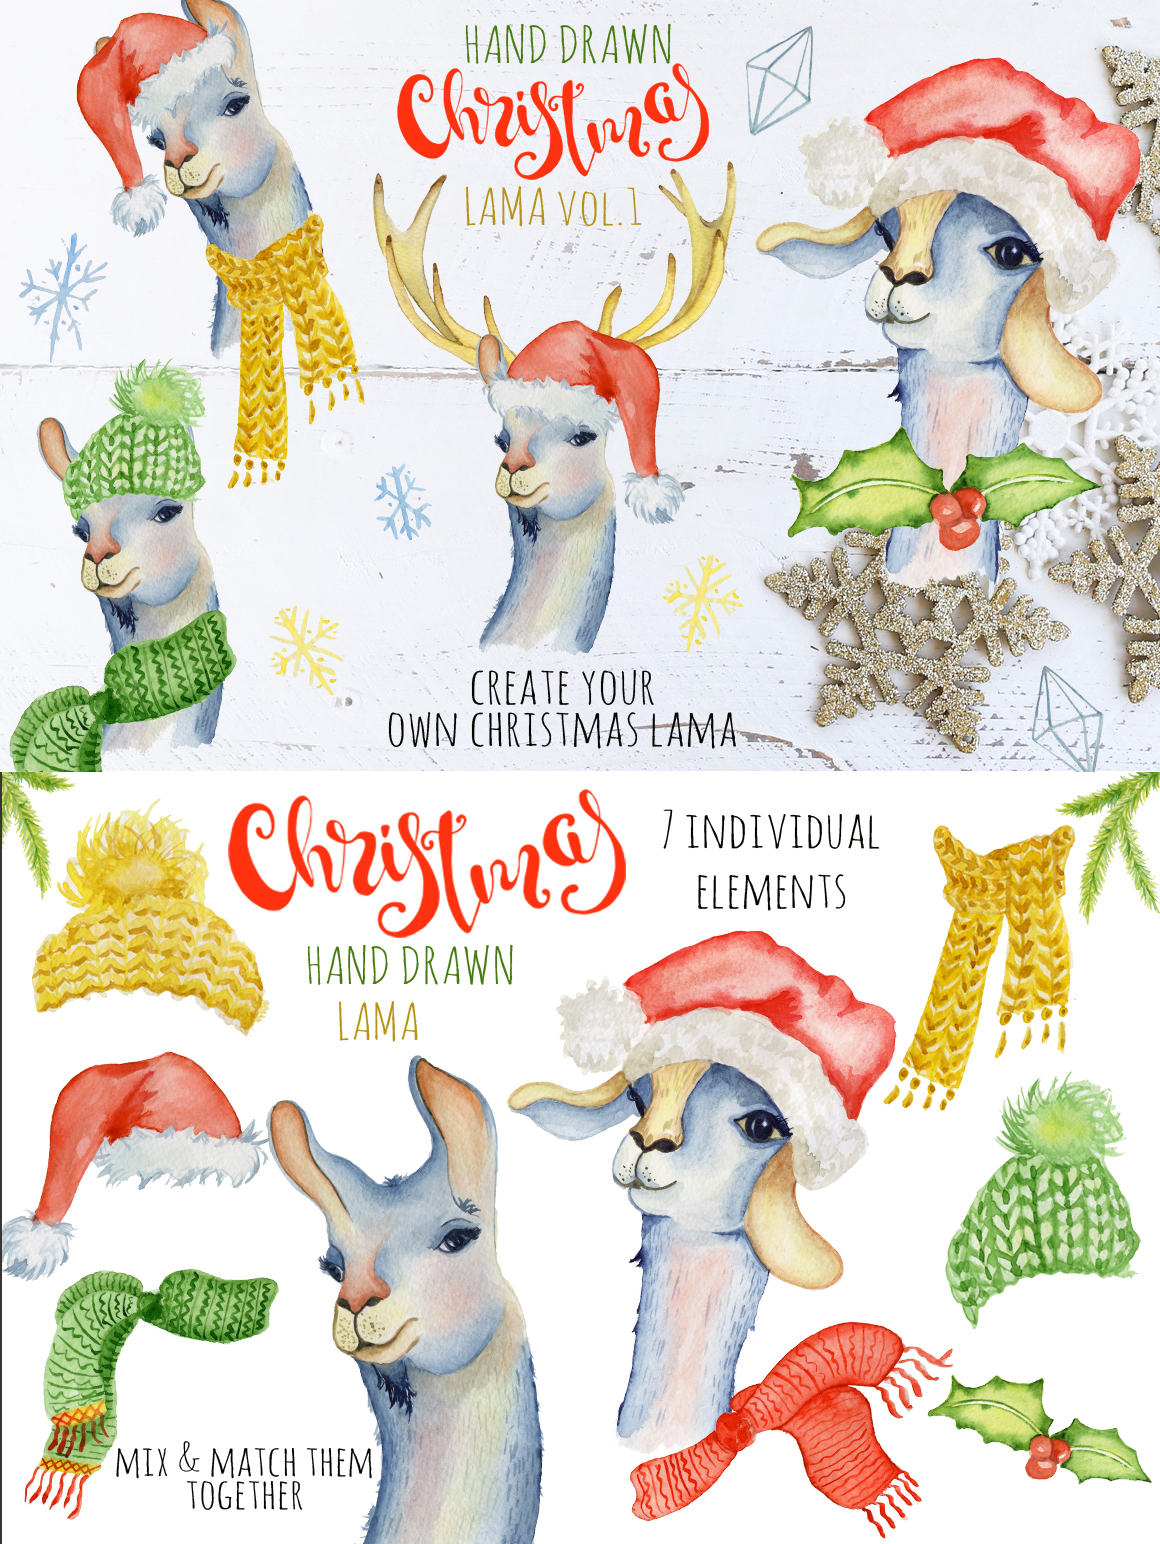 Winter Wonderland Clipart: 14 Christmas Watercolor Clipart Bundles in 1 - $28 - 9 Lama1